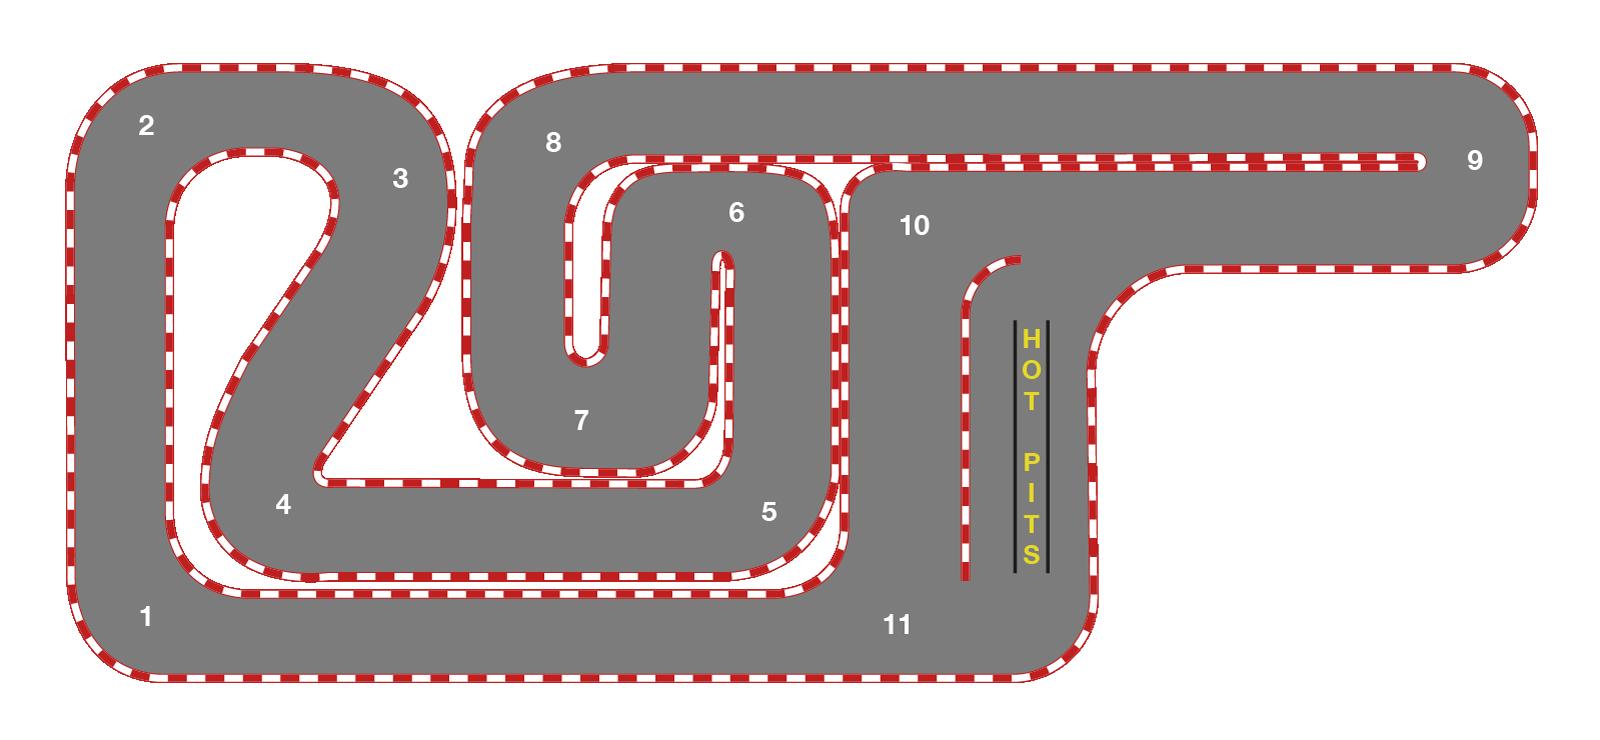 Track clipart indoor track. We encourage speeding high